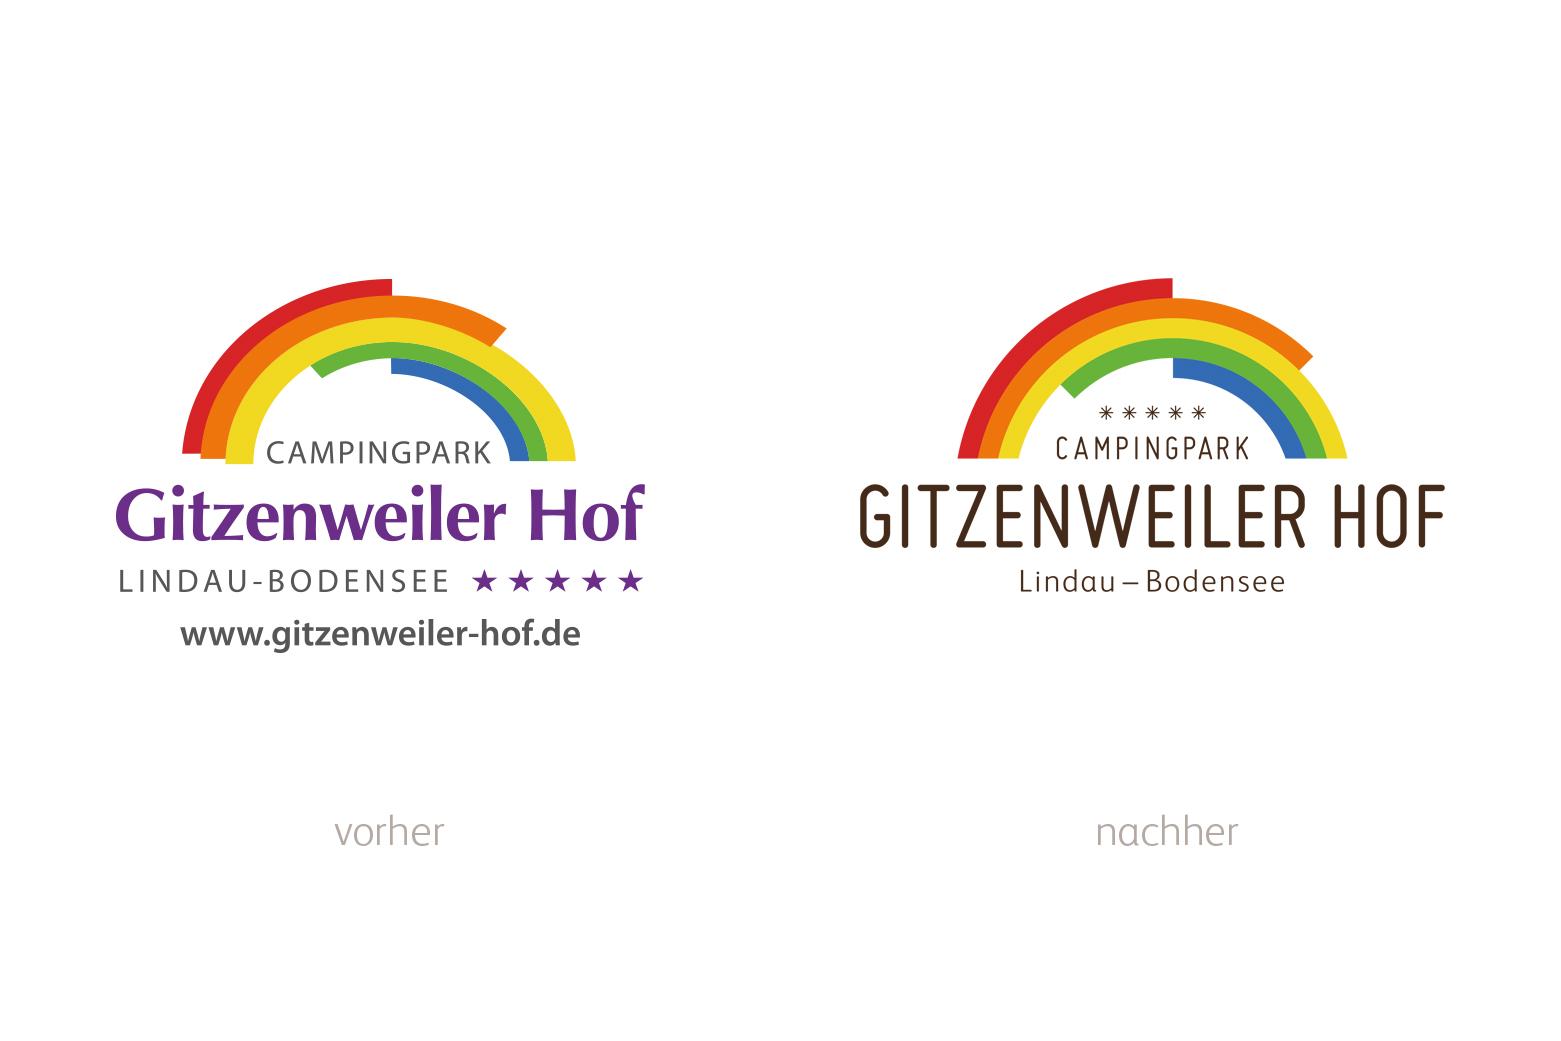 Gitzenweiler Hof Camping Logo 1